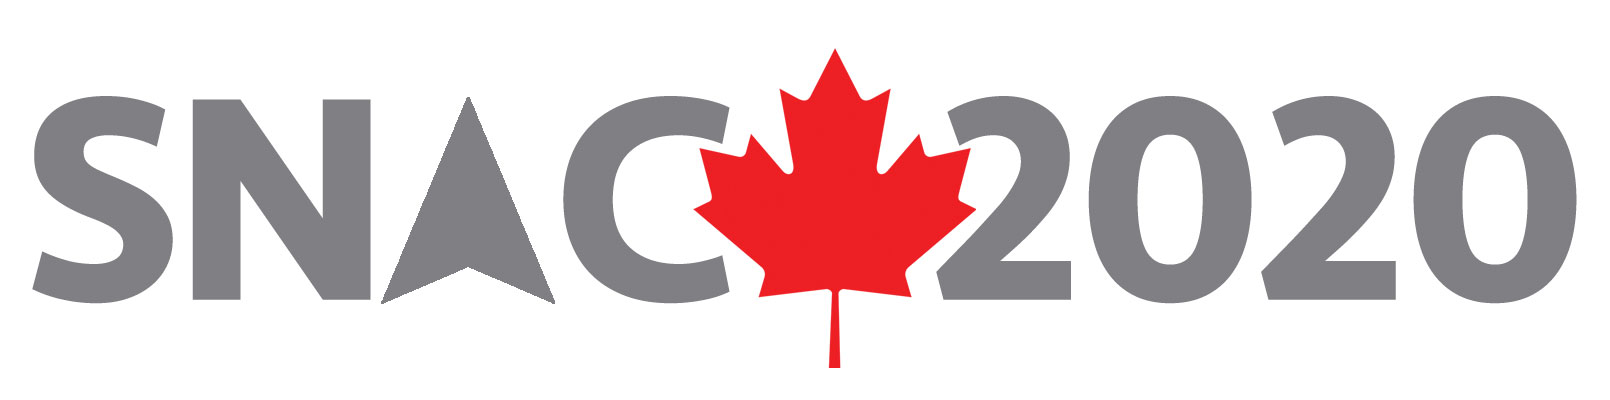 SNAC2020 logo